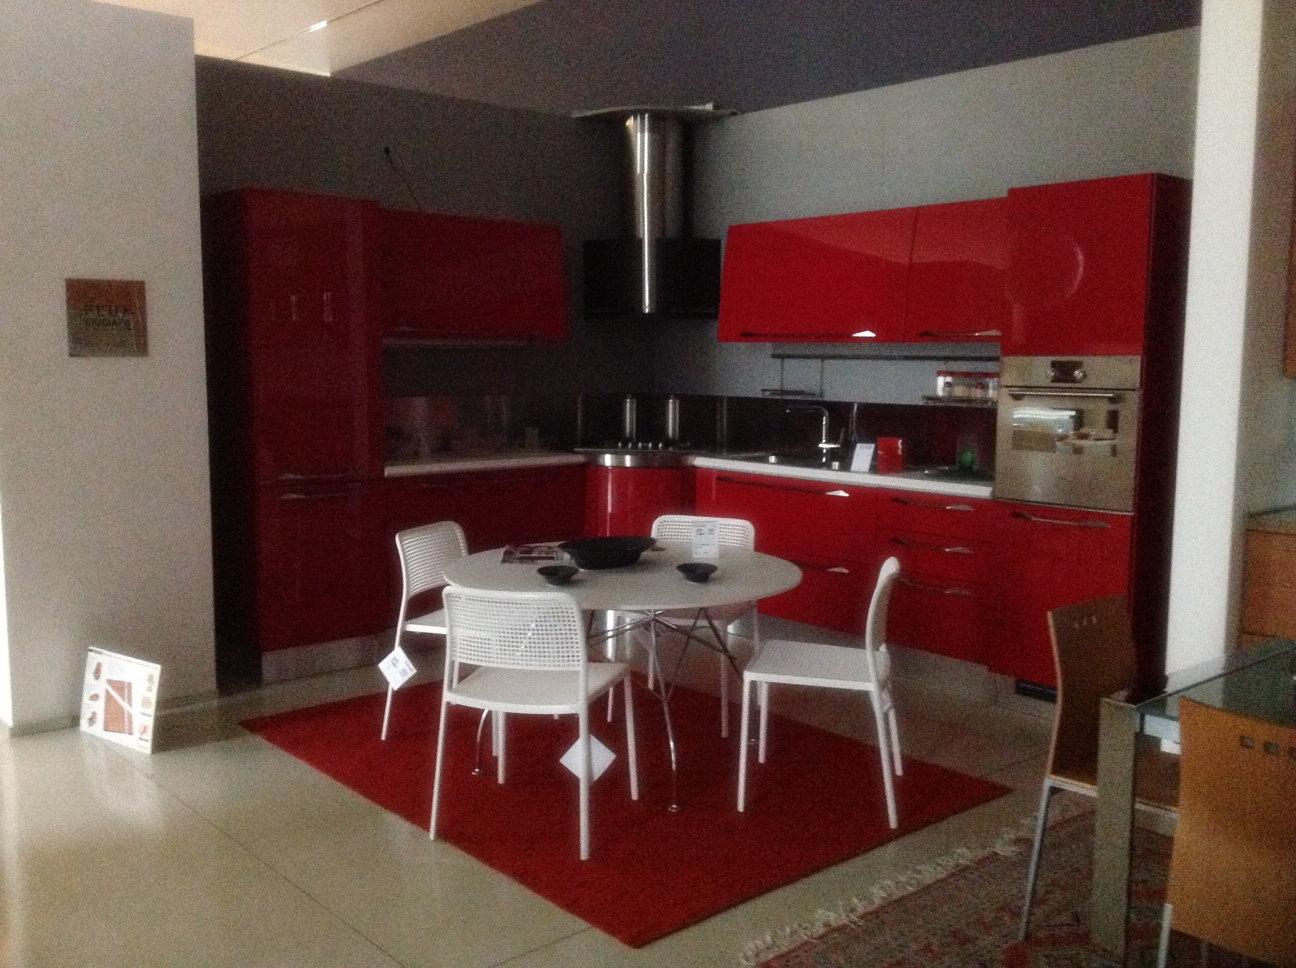 Scavolini flux rossa giugiaro cucine a prezzi scontati - Cucina moderna rossa ...